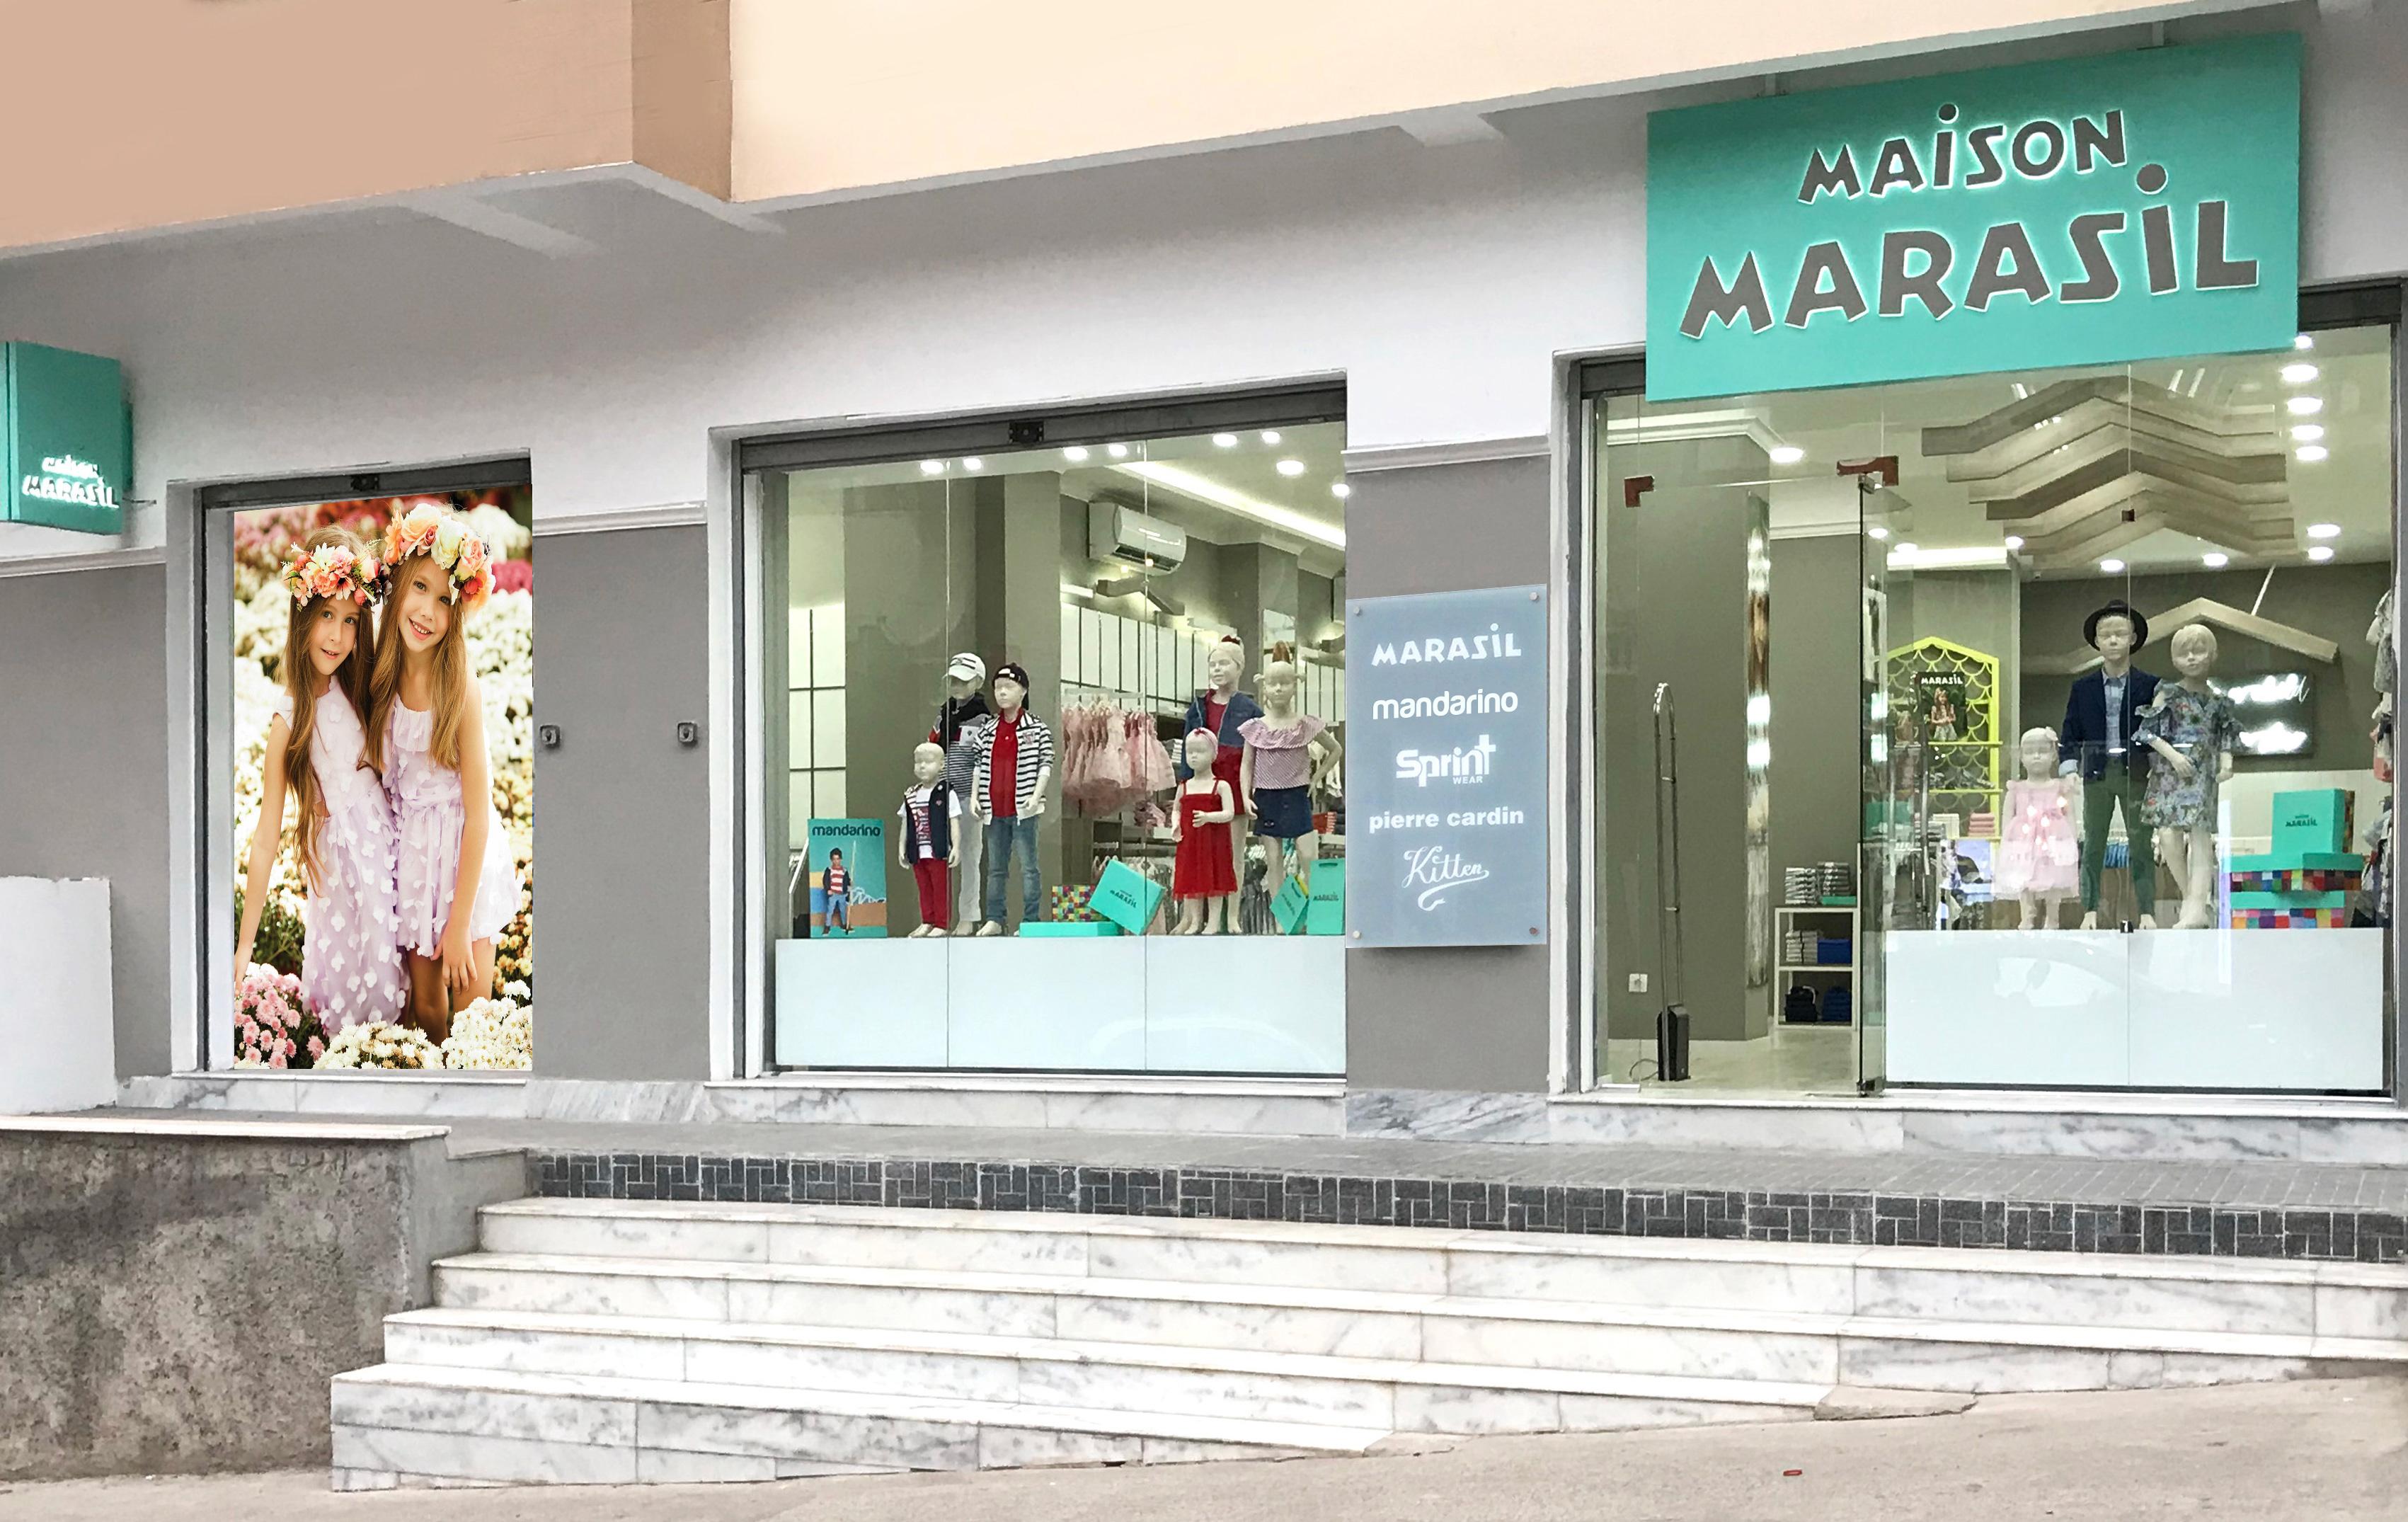 54ff041d637 Νέο κατάστημα Maison Marasil στην Αλγερία - ΤΑ ΝΕΑ